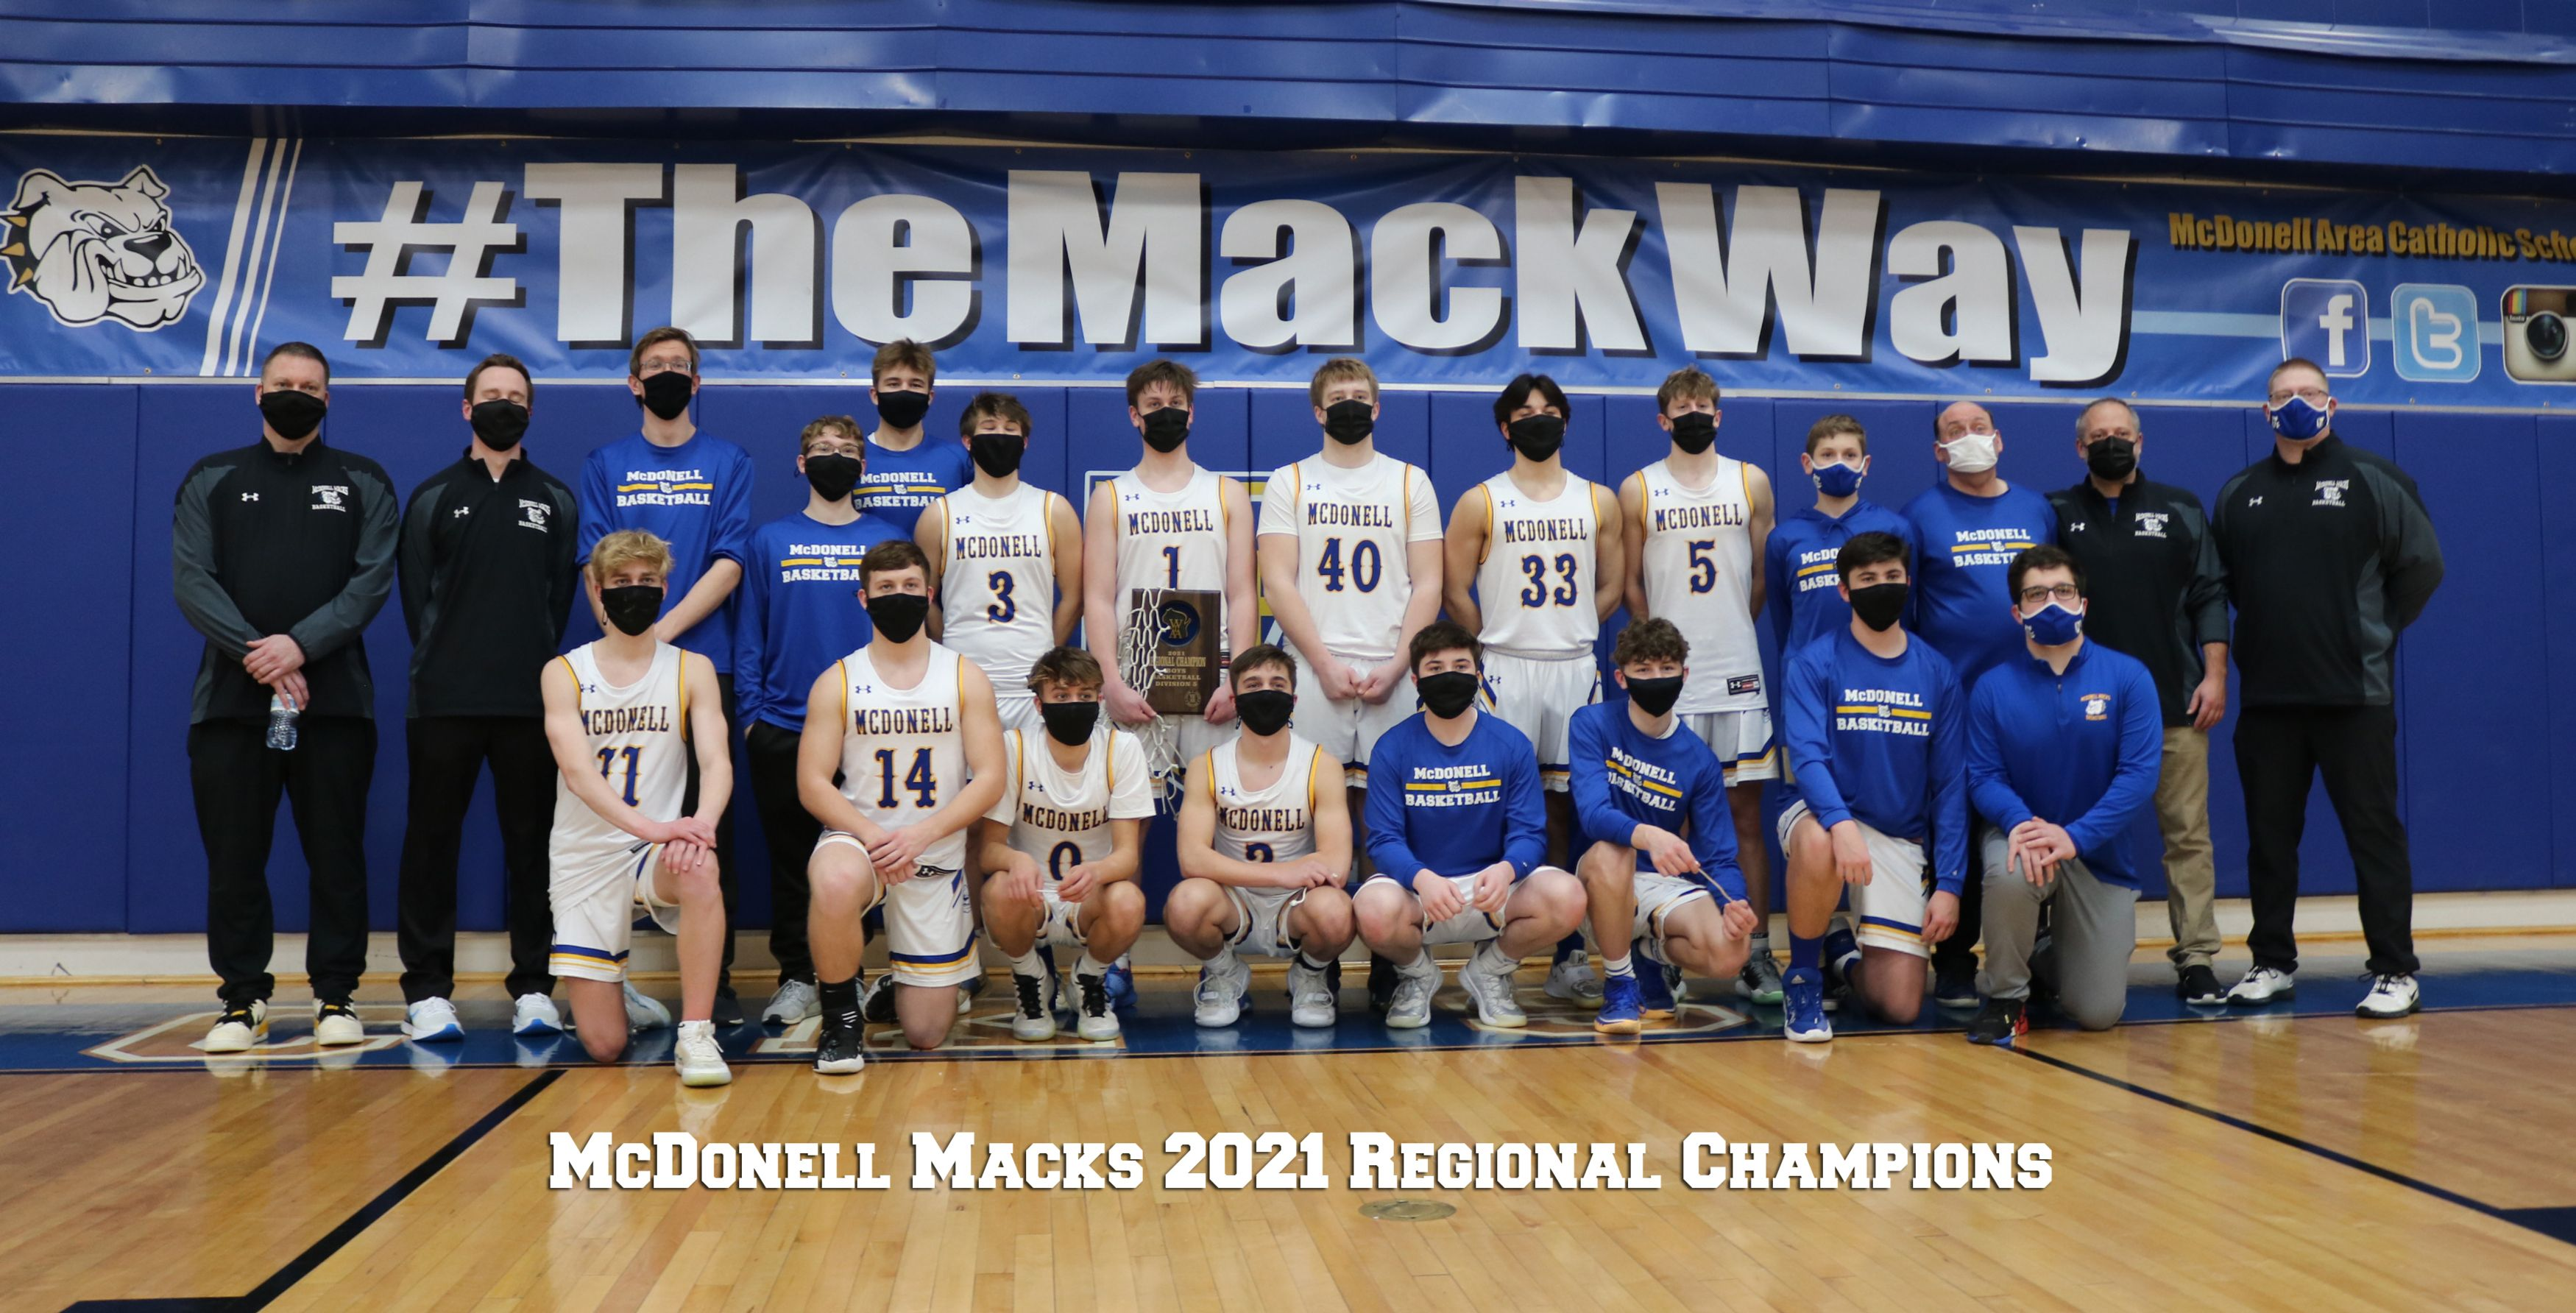 Macks Regional Champions